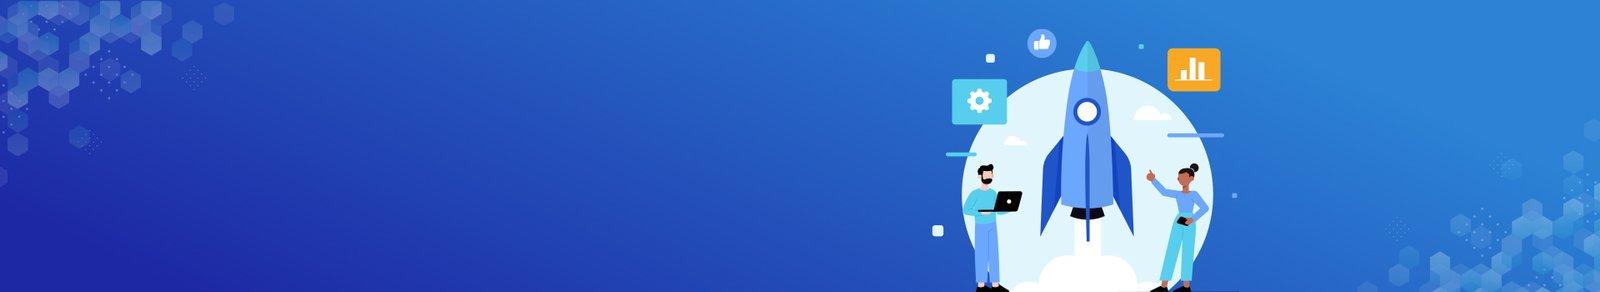 Startup Development Company Banner